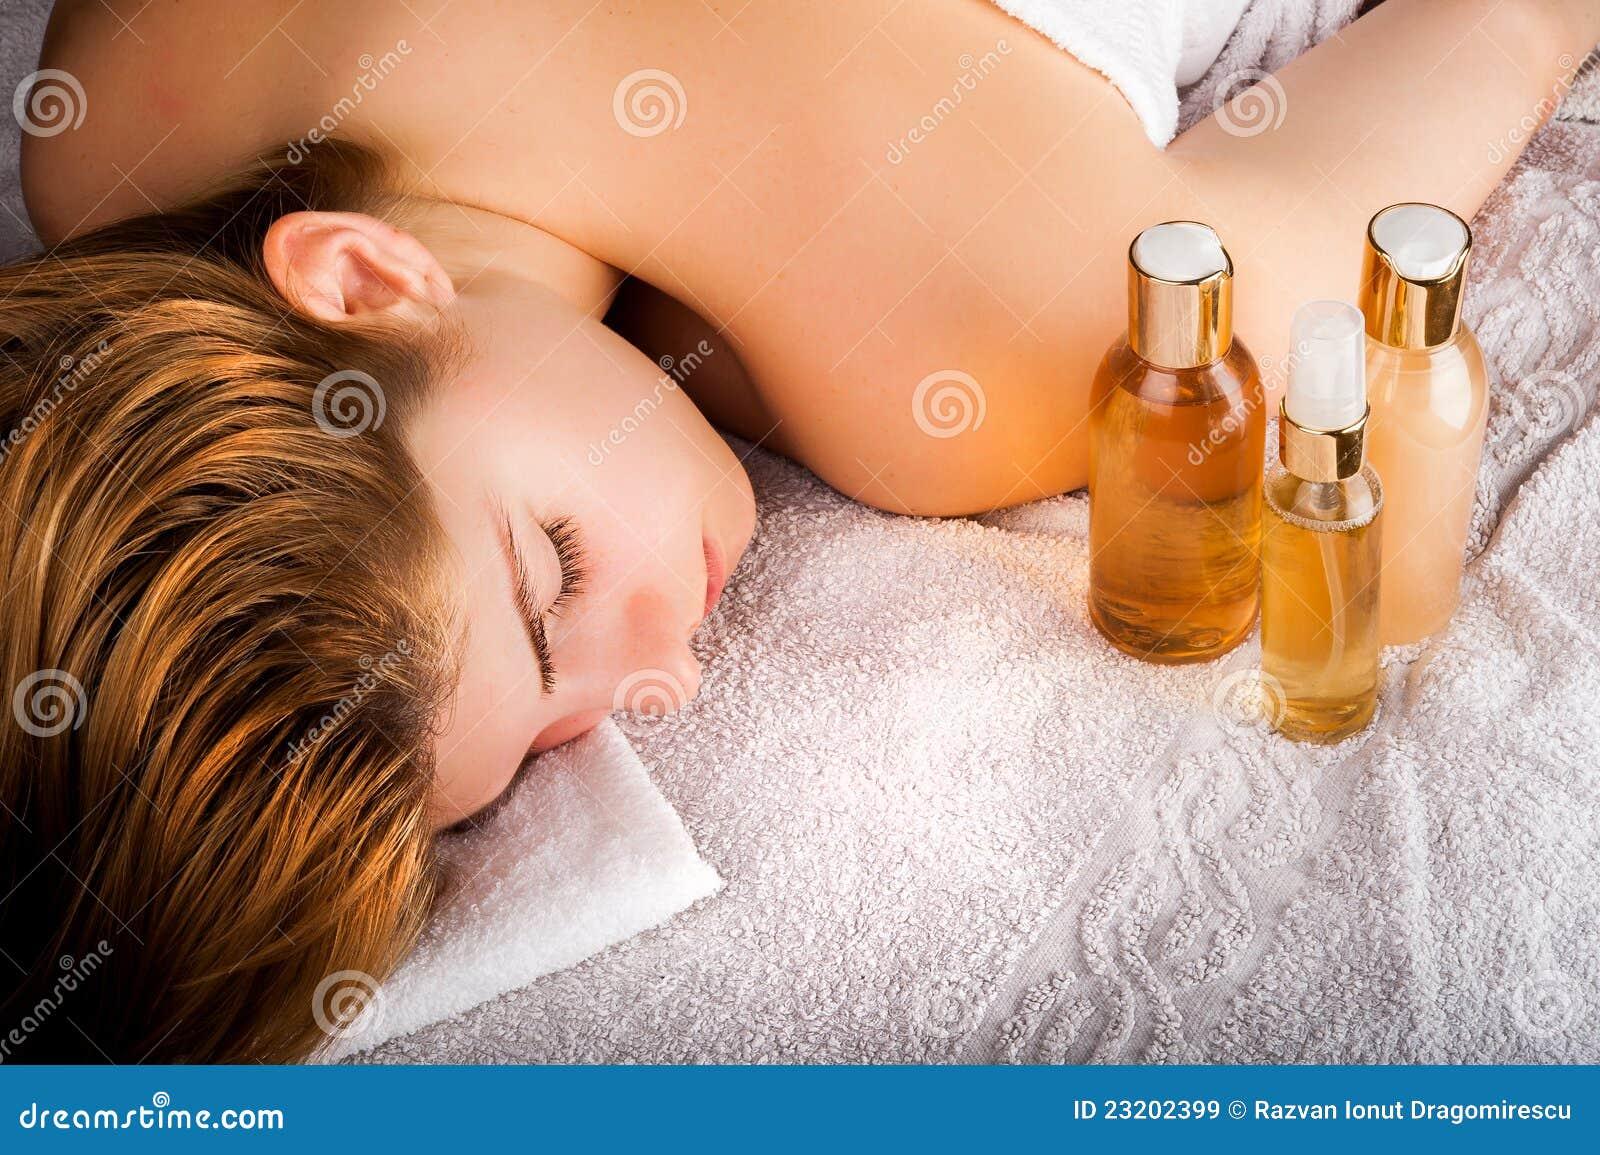 state charlotte relaxation massage